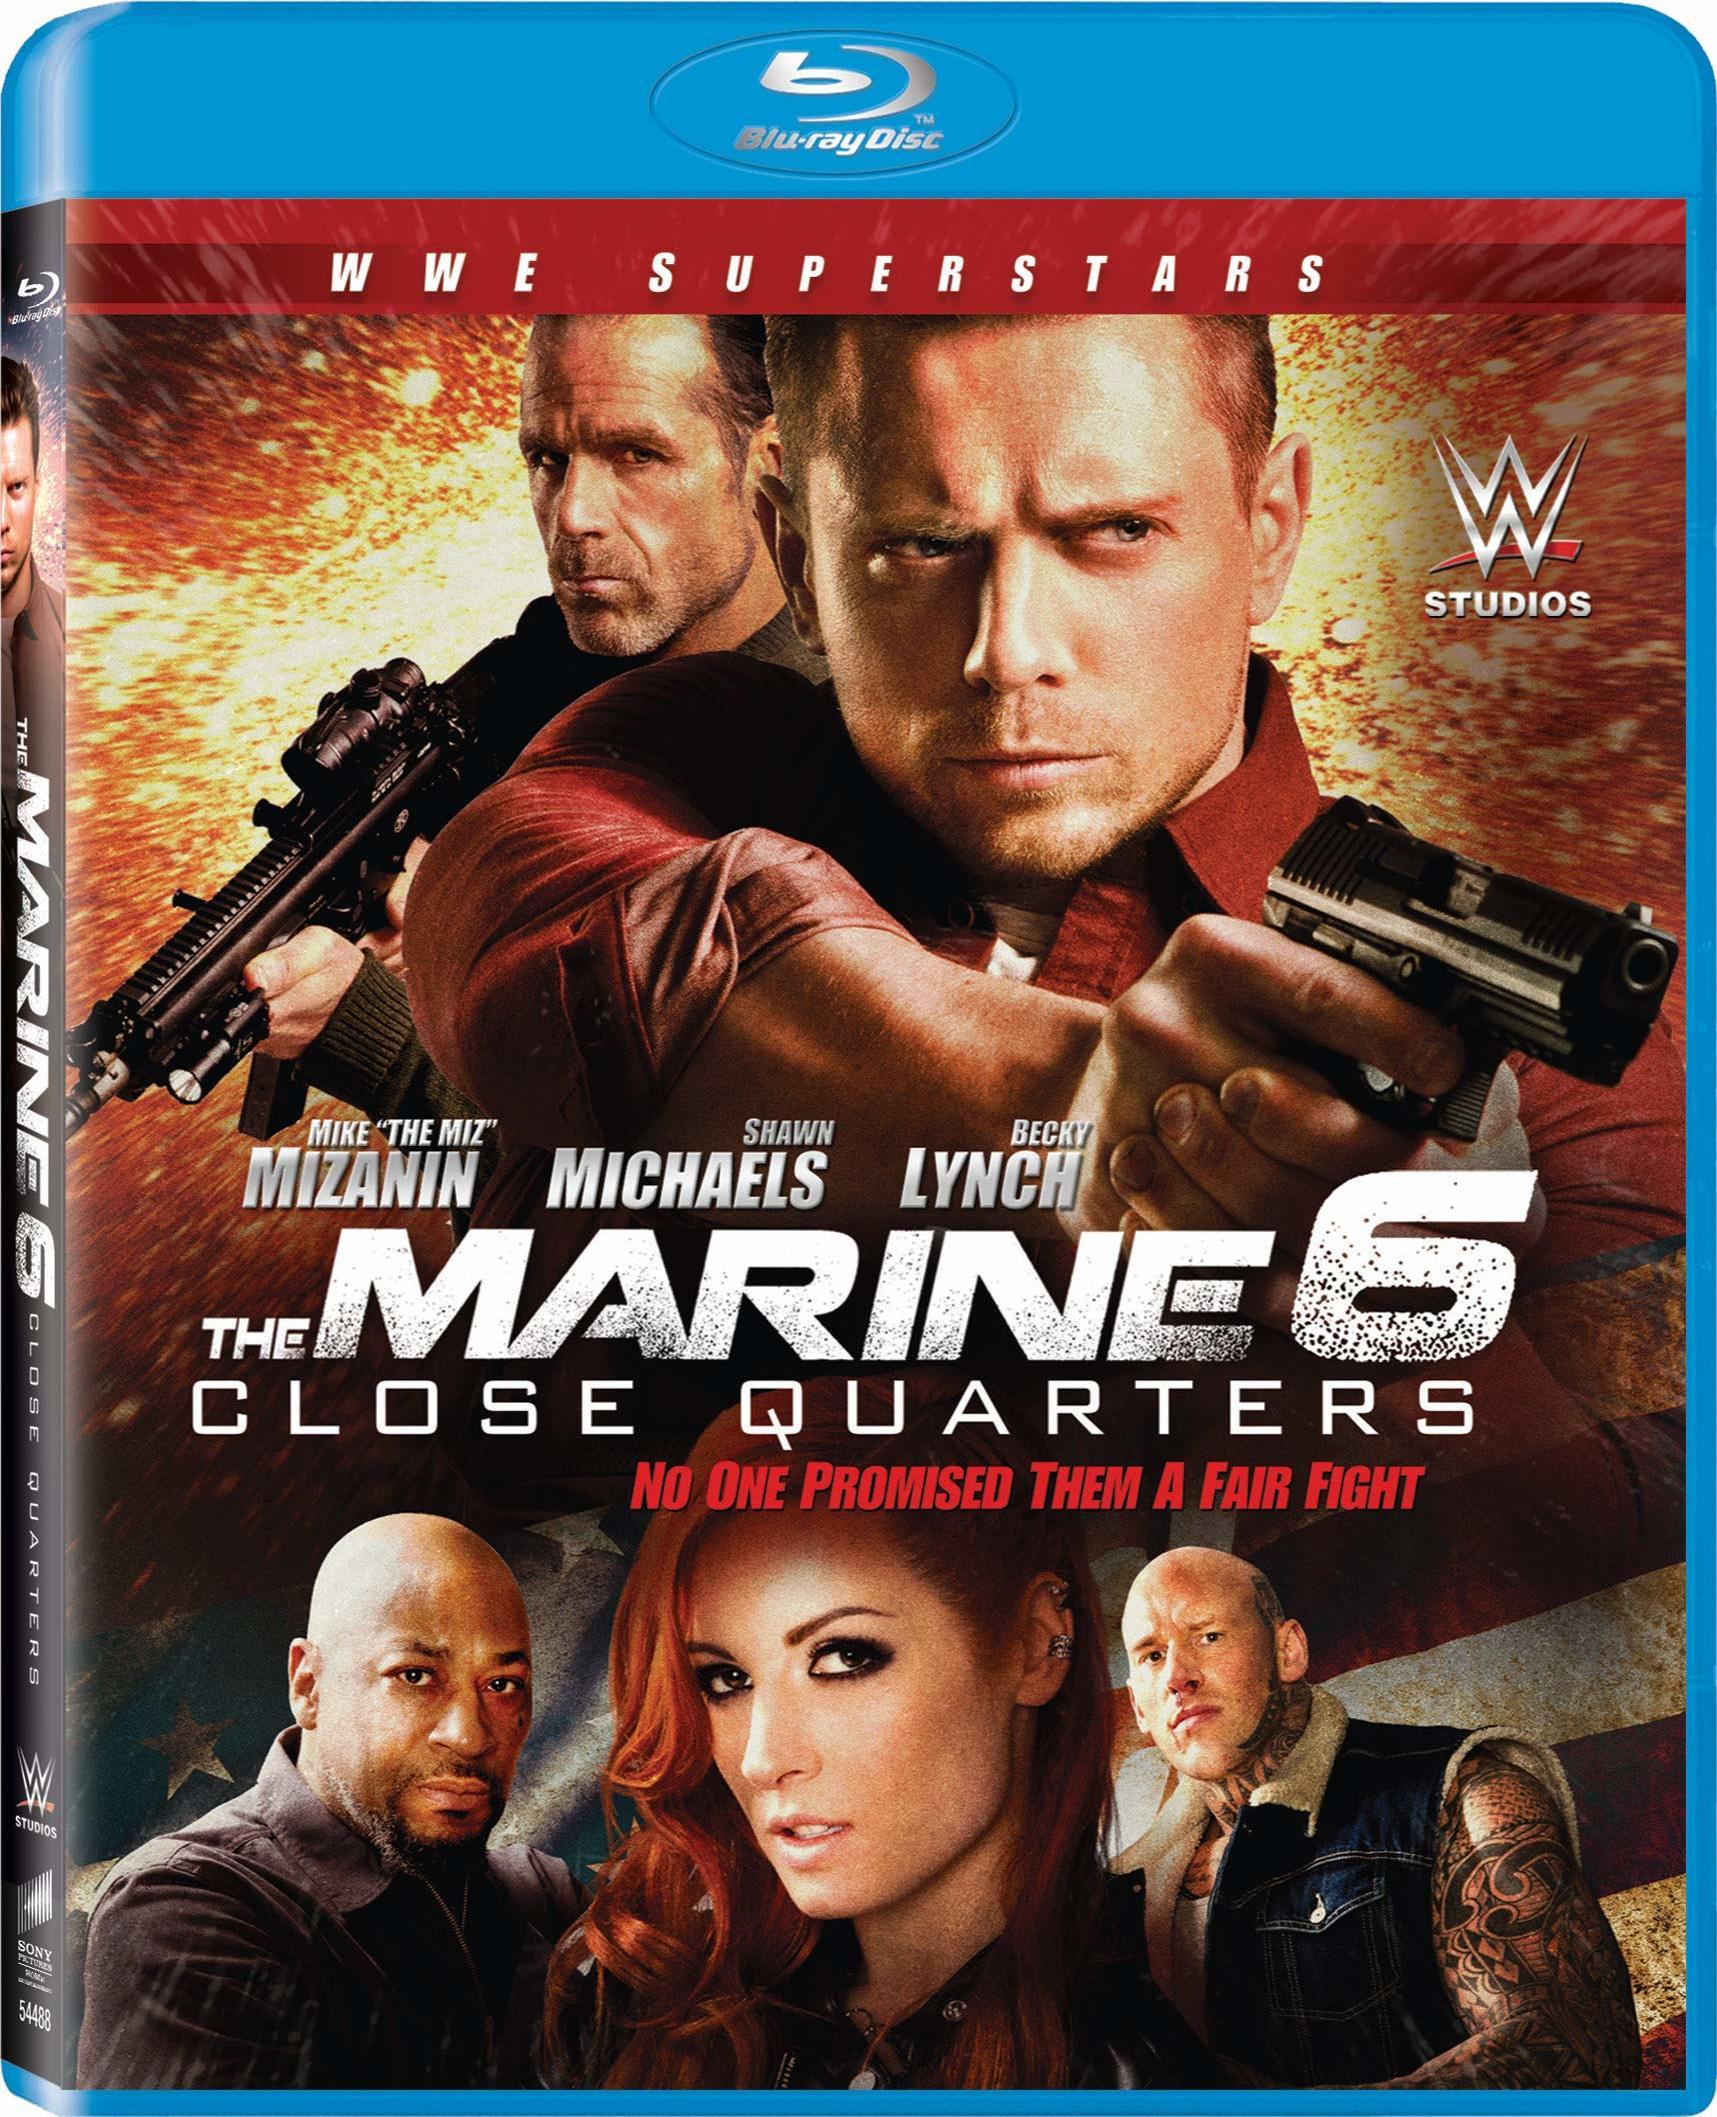 The Marine 6: Close Quarters (Blu-ray)(Region A)